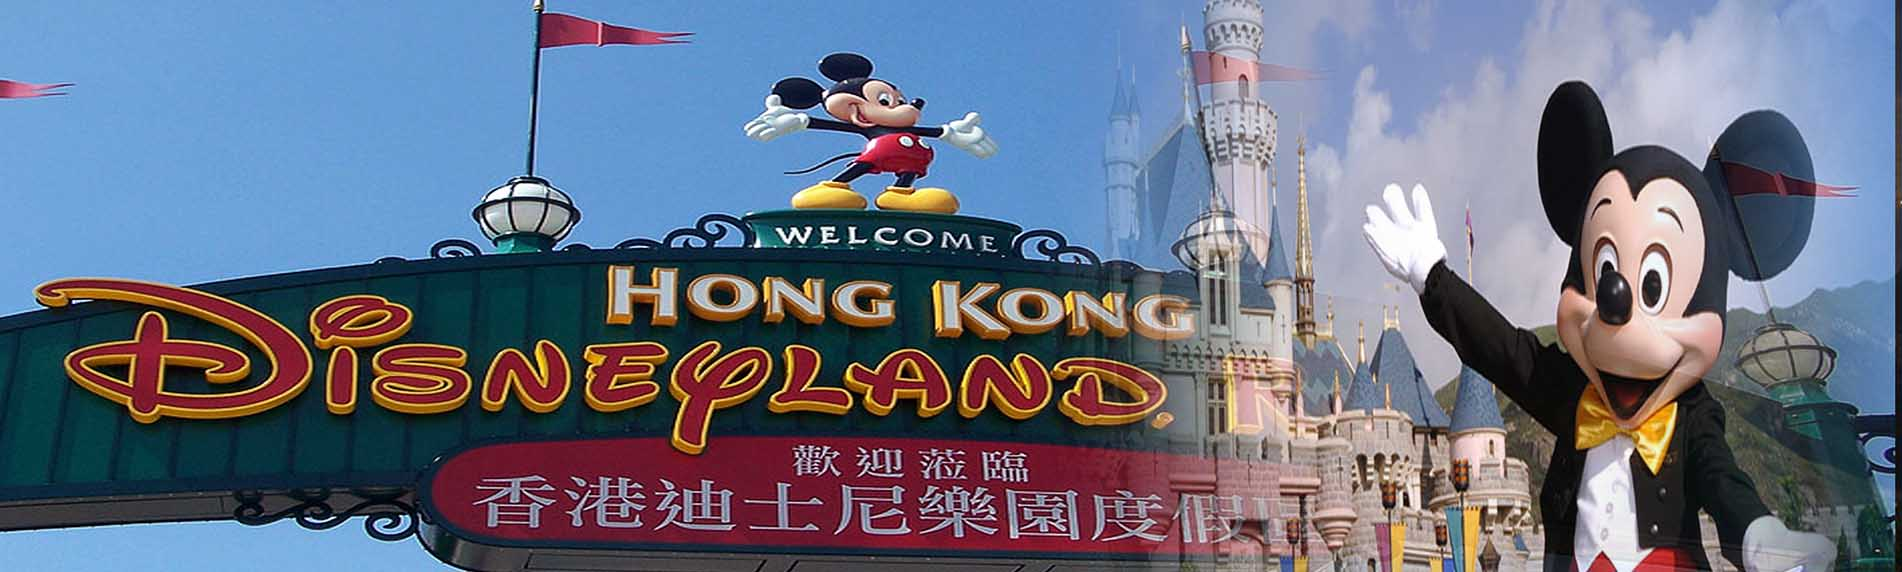 6 Nights And 7 Days Hong Kong Holiday Package With Disneyland Voucher Hongkong Scenic